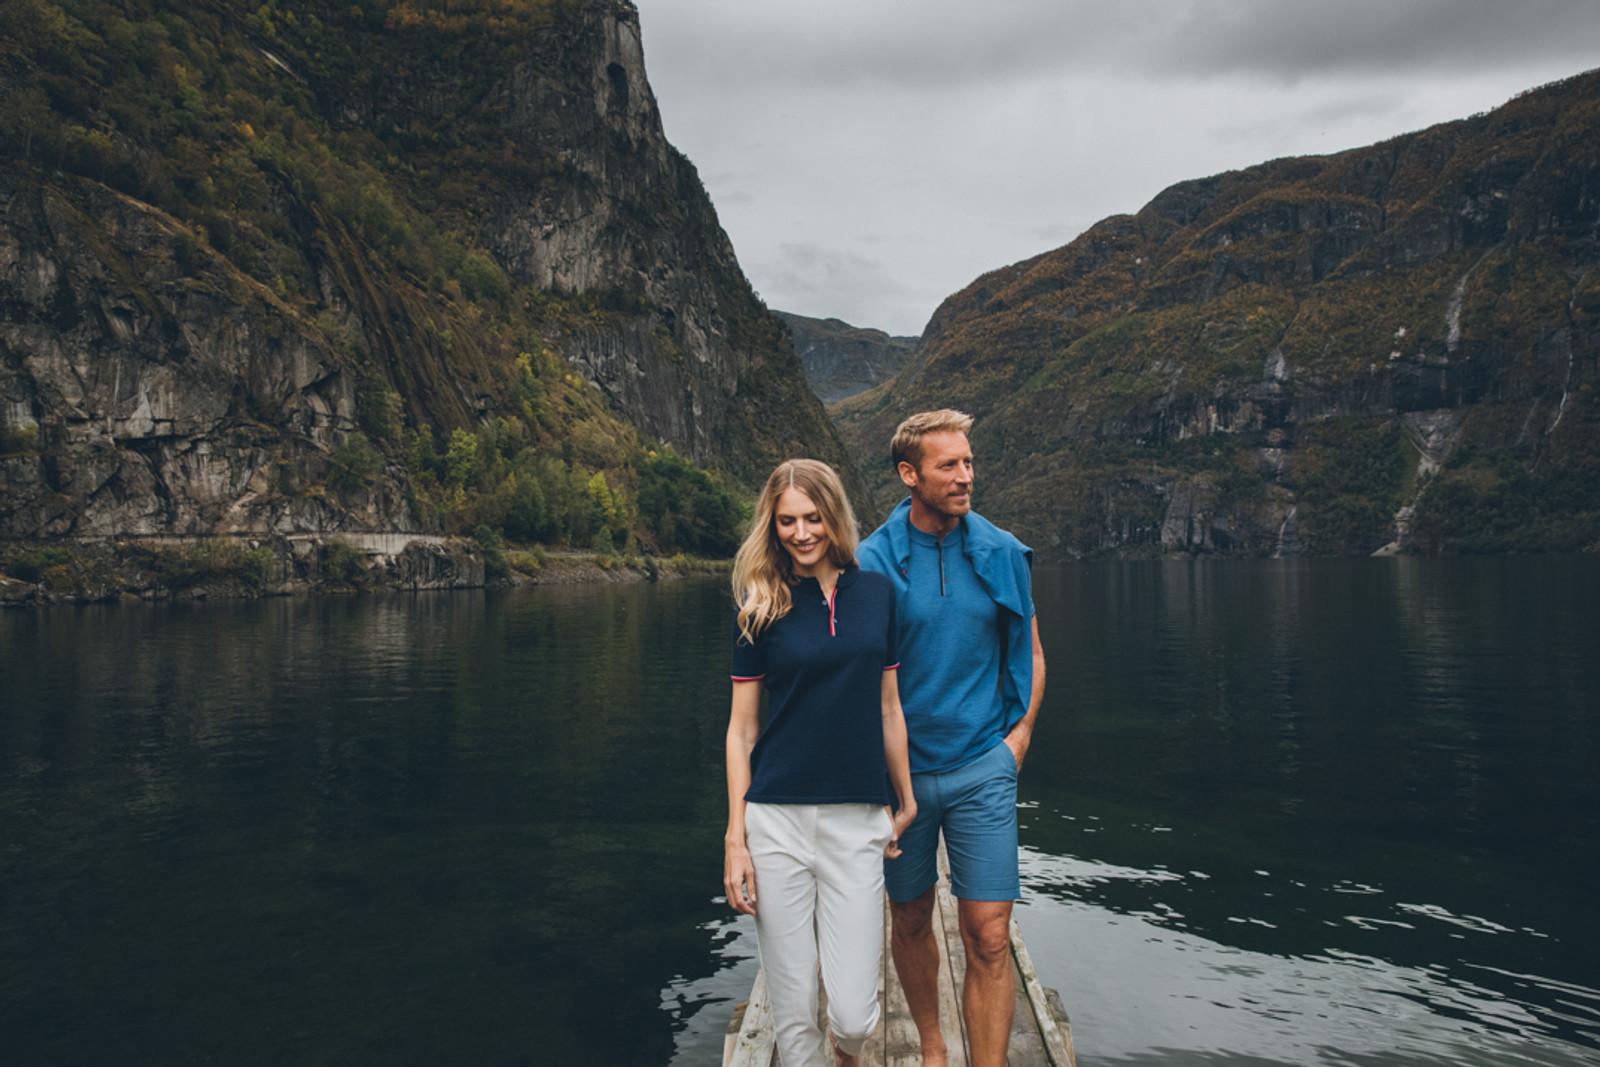 Couple walking on dock wearing Dale of Norway's Fredrikke ladies T-shirt in Navy/Red Rose/Off White, 93841-C and Fredrik mens T-shirt in Medium Blue Mel/Light Grey/Off White Mel/Navy Mel, 93771-H